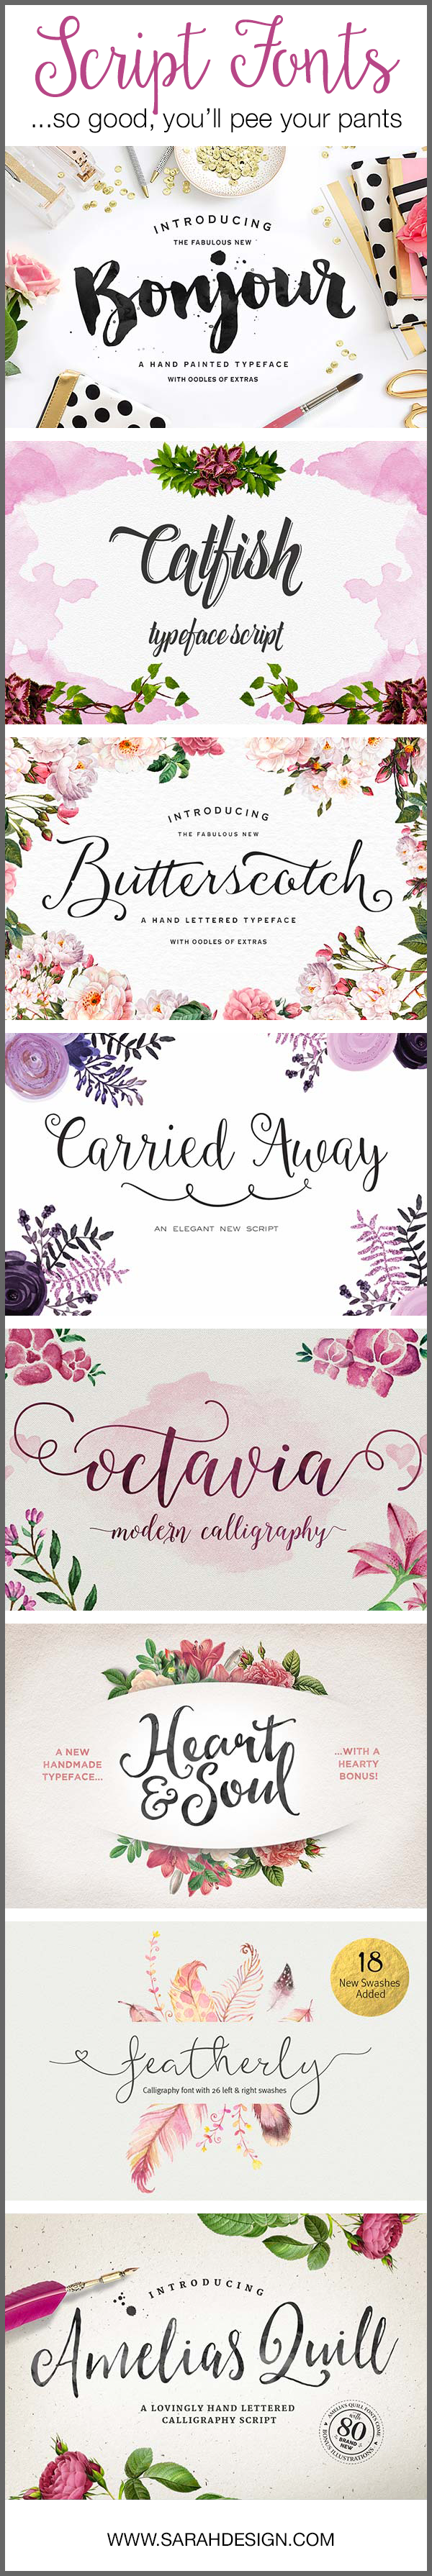 script-font-infographic-sarahdesign3.png